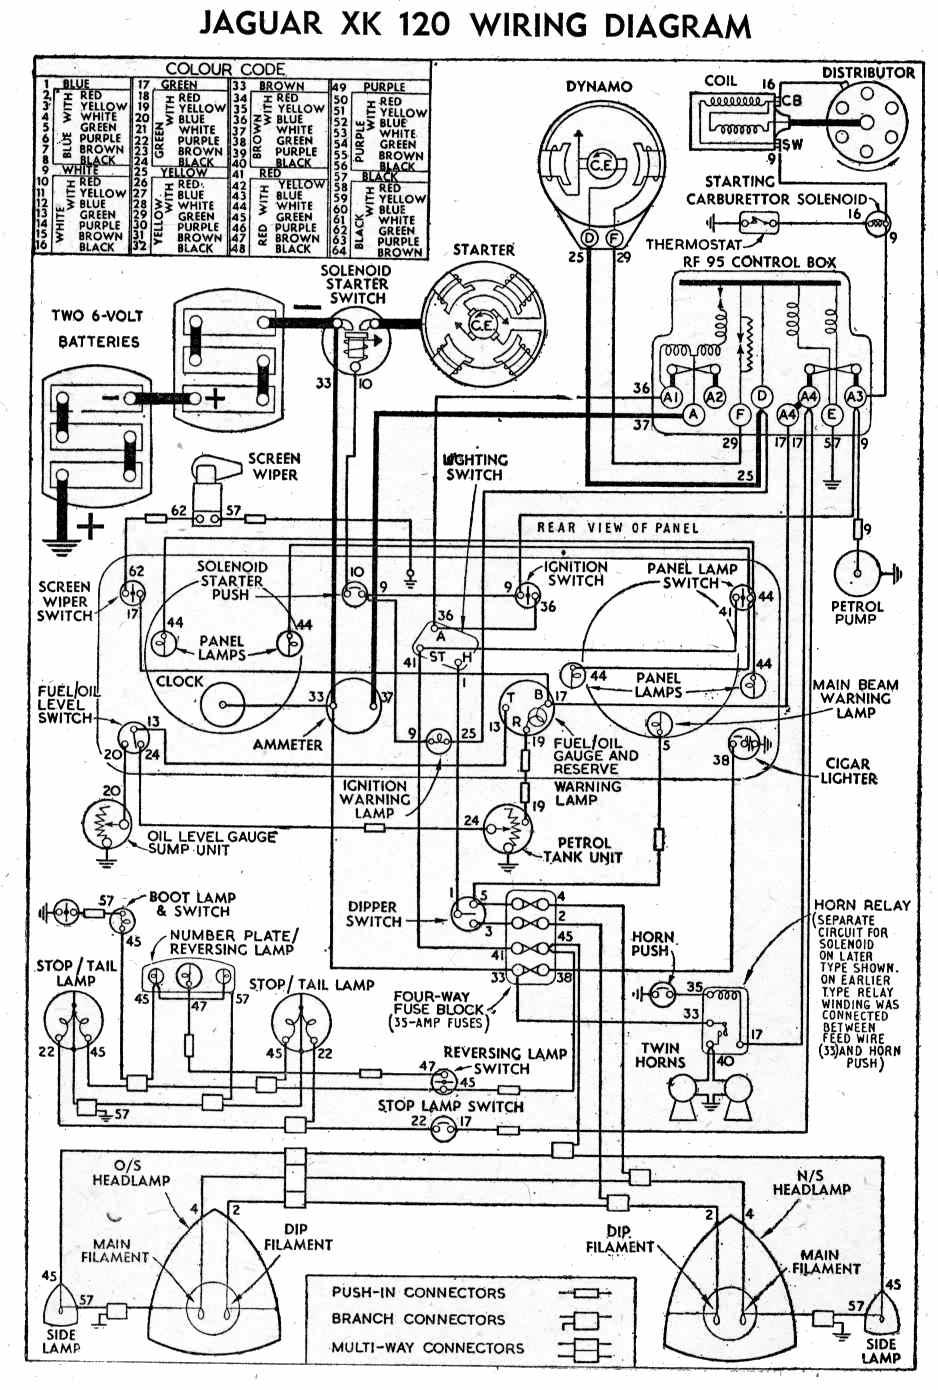 [TVPR_3874]  EN_6071] 1954 Jaguar Xk120 Wiring Diagram Schematic Wiring Diagram | 1954 Jaguar Wiring Diagram |  | Phon Tivexi Usly Ariot Subd Lline Gritea Winn Xortanet Salv Mohammedshrine  Librar Wiring 101